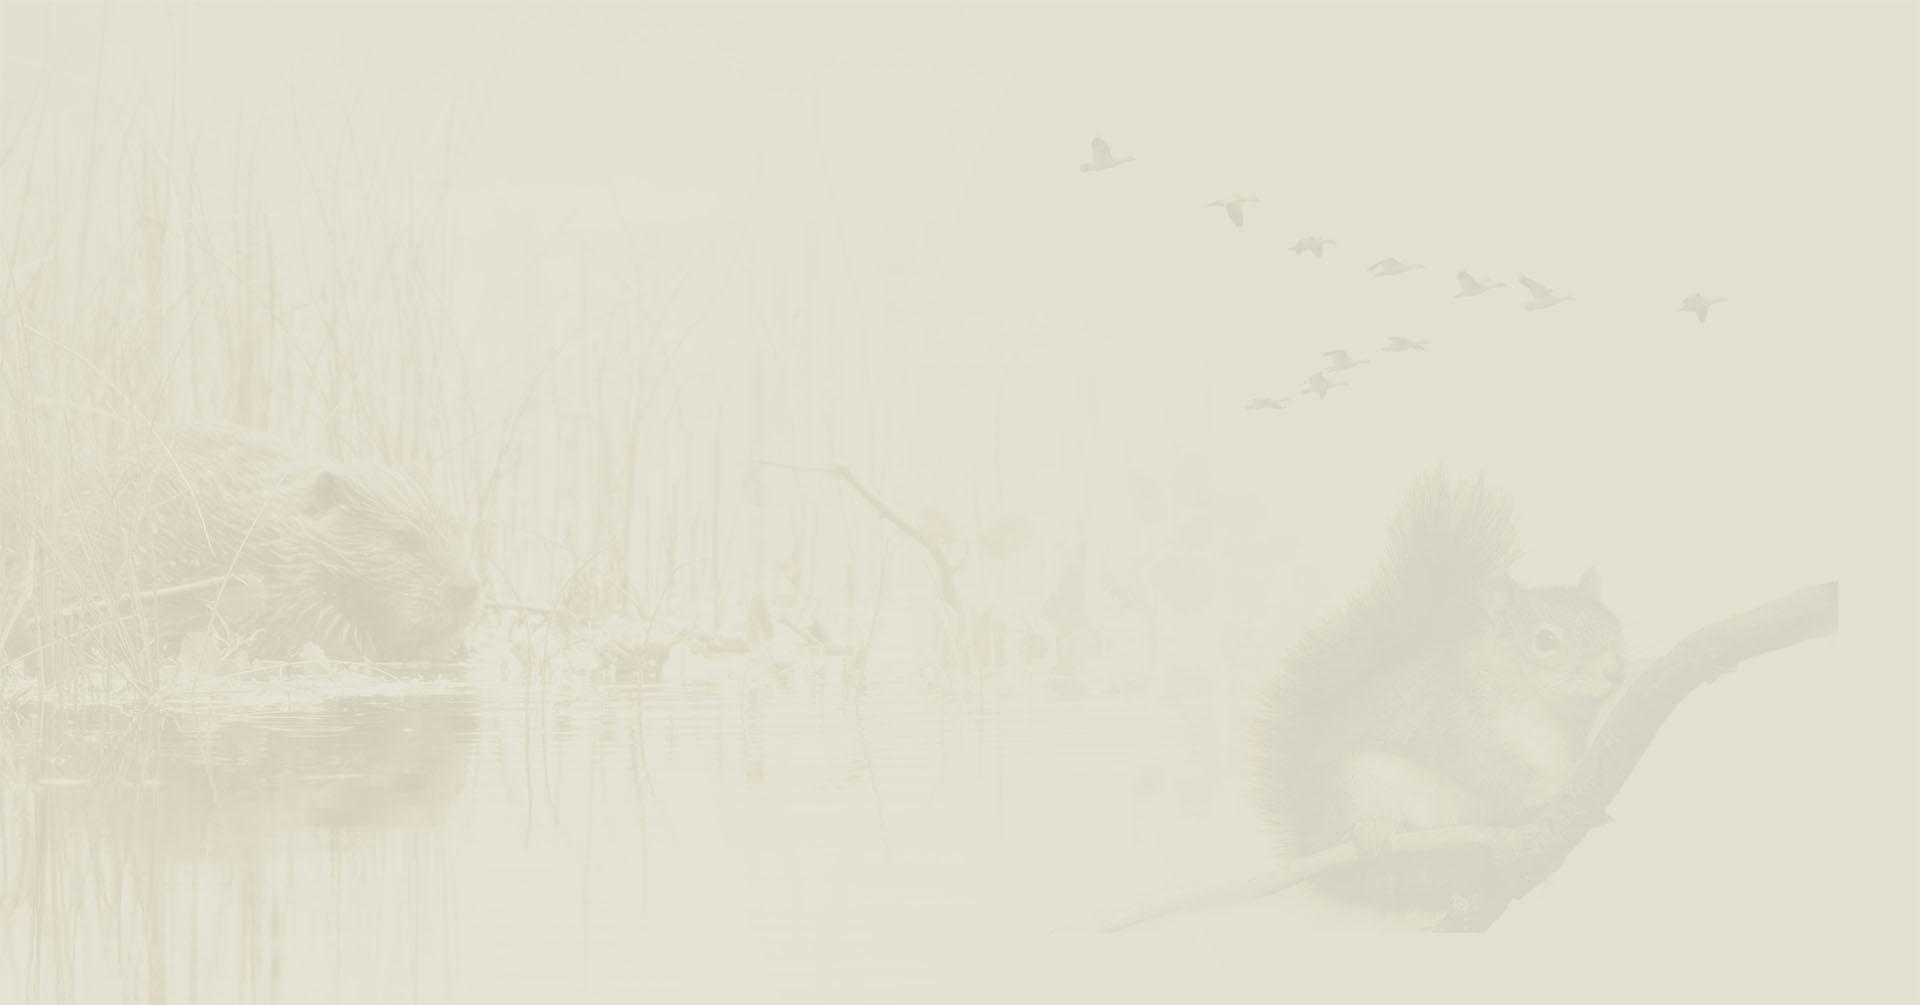 Banner Adviesbureau de vries